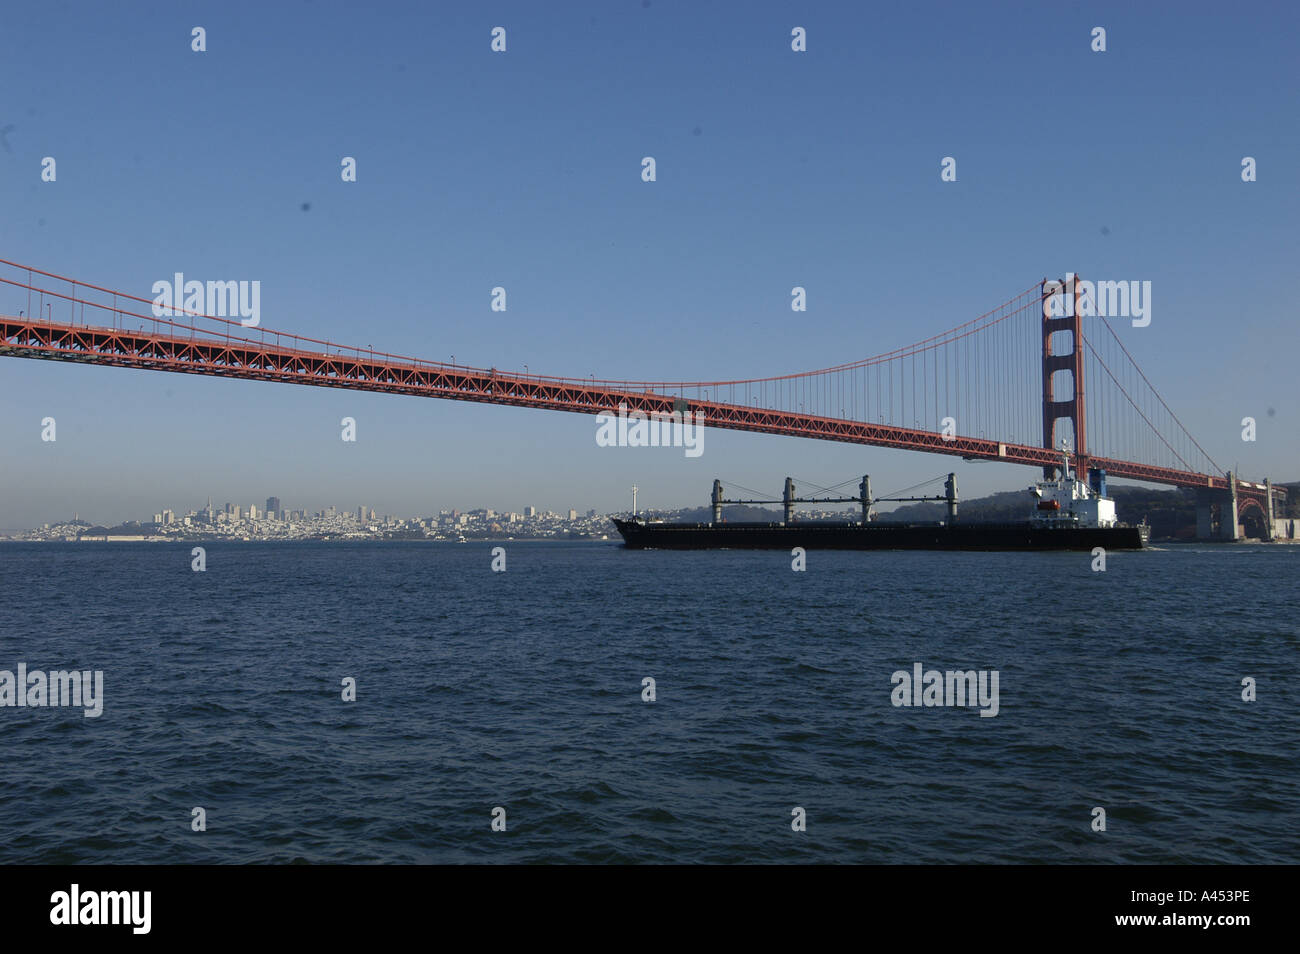 Transatlantic Bridge >> Cargo Vessel Crossing Under The Golden Gate Bridge San Francisco Bay